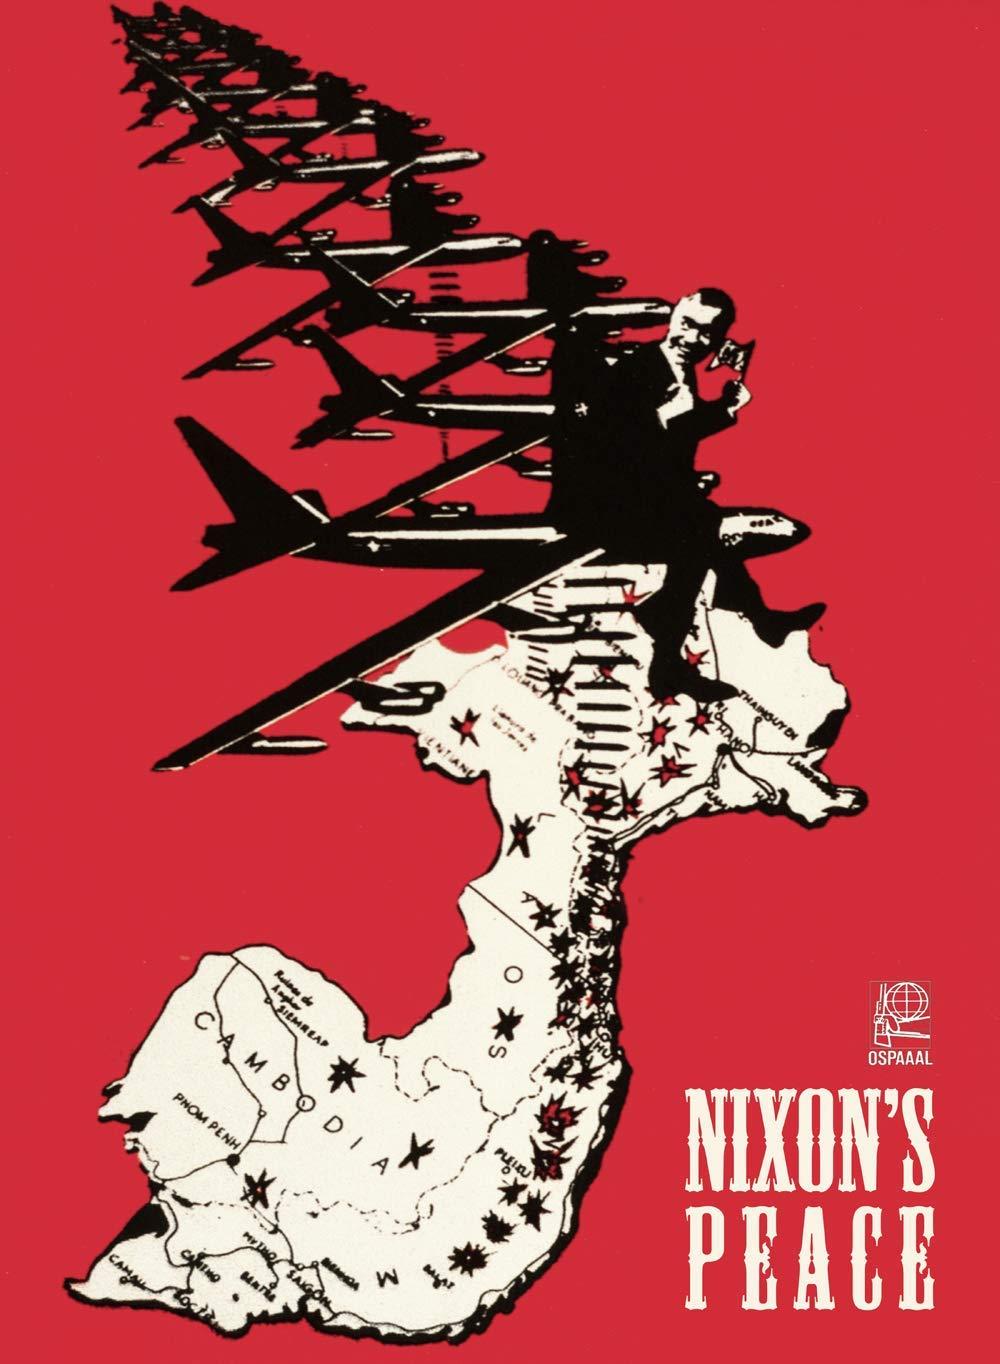 11x17Political Decoration Poster.Solidarity with Vietnam.Laos.Cambodia.Nixon.9096